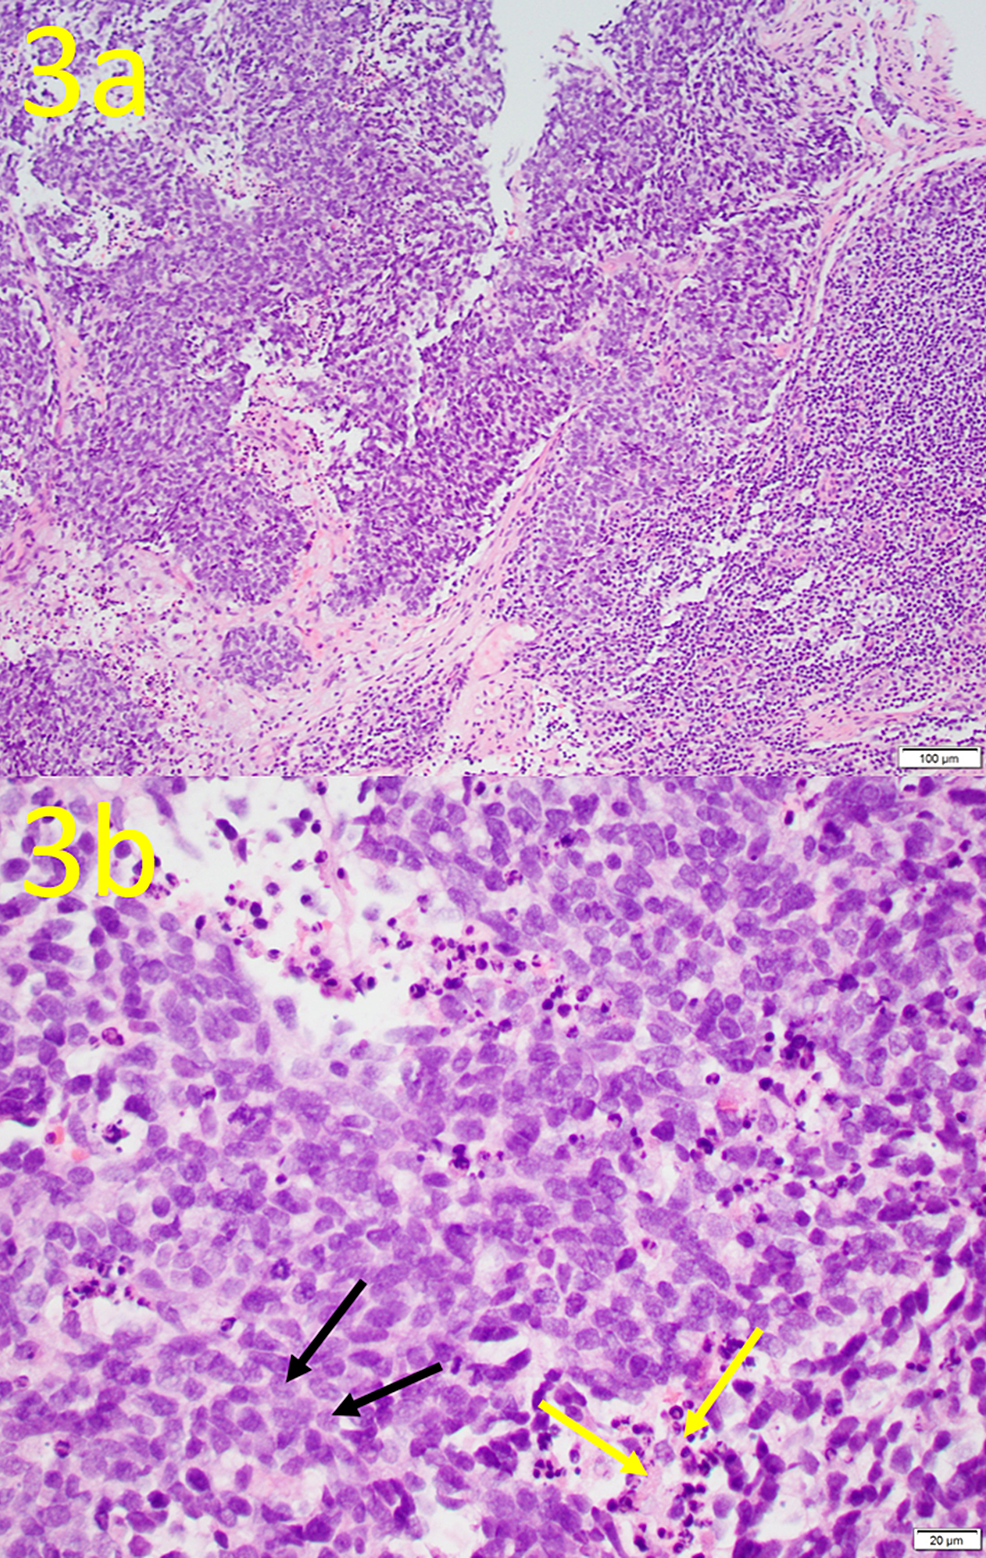 Hematoxylin-and-Eosin-(H&E)-Stain-of-Biopsy-Tissue